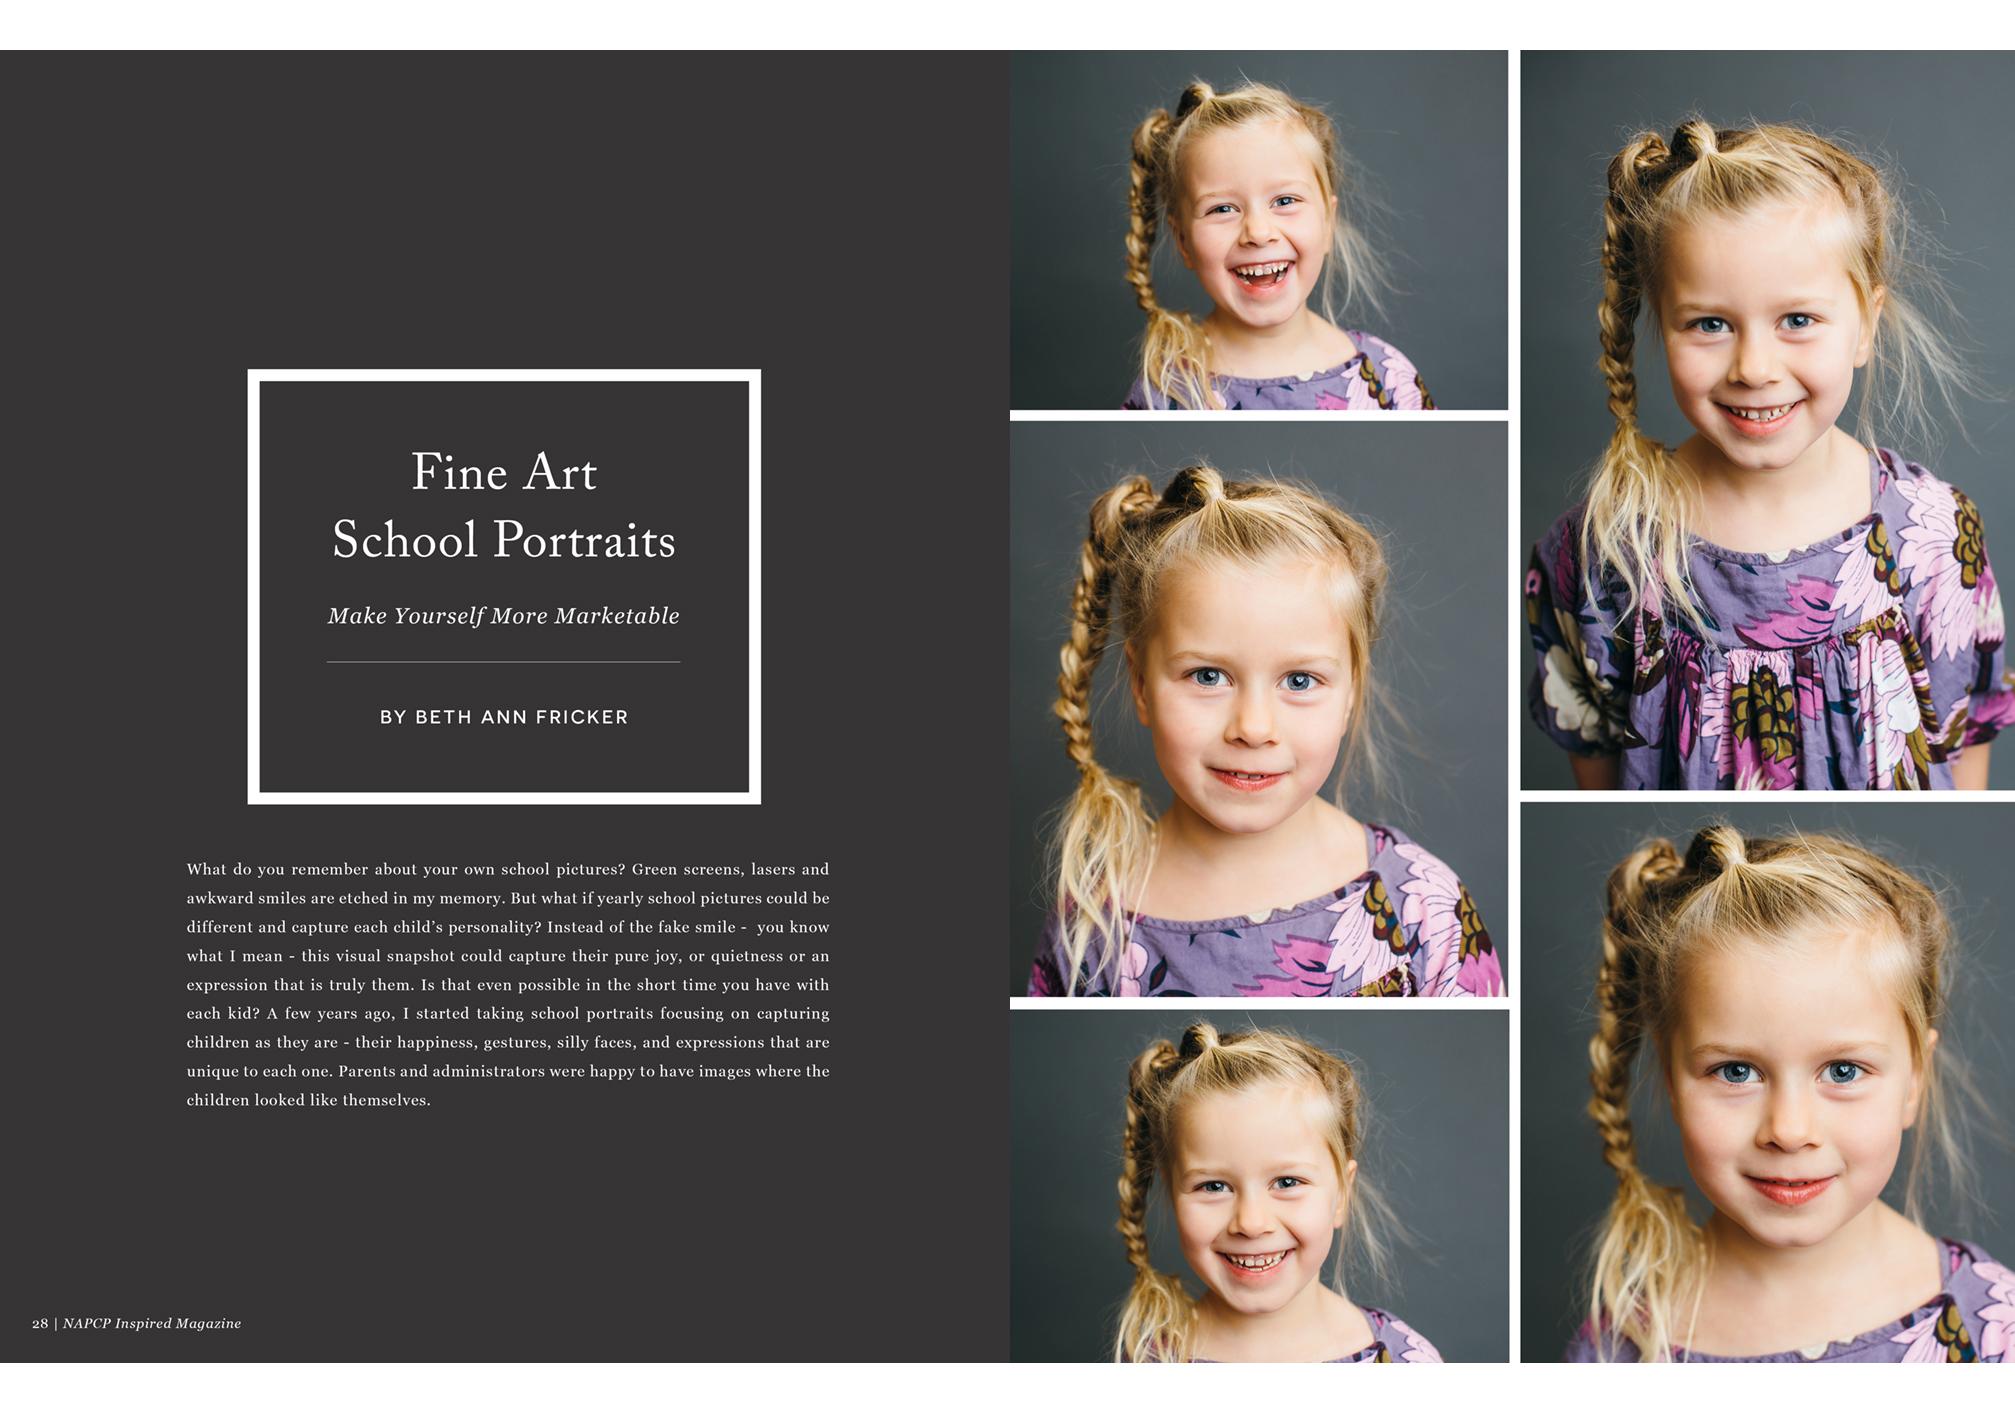 Fine Art School Portraits, Beth Ann Fricker